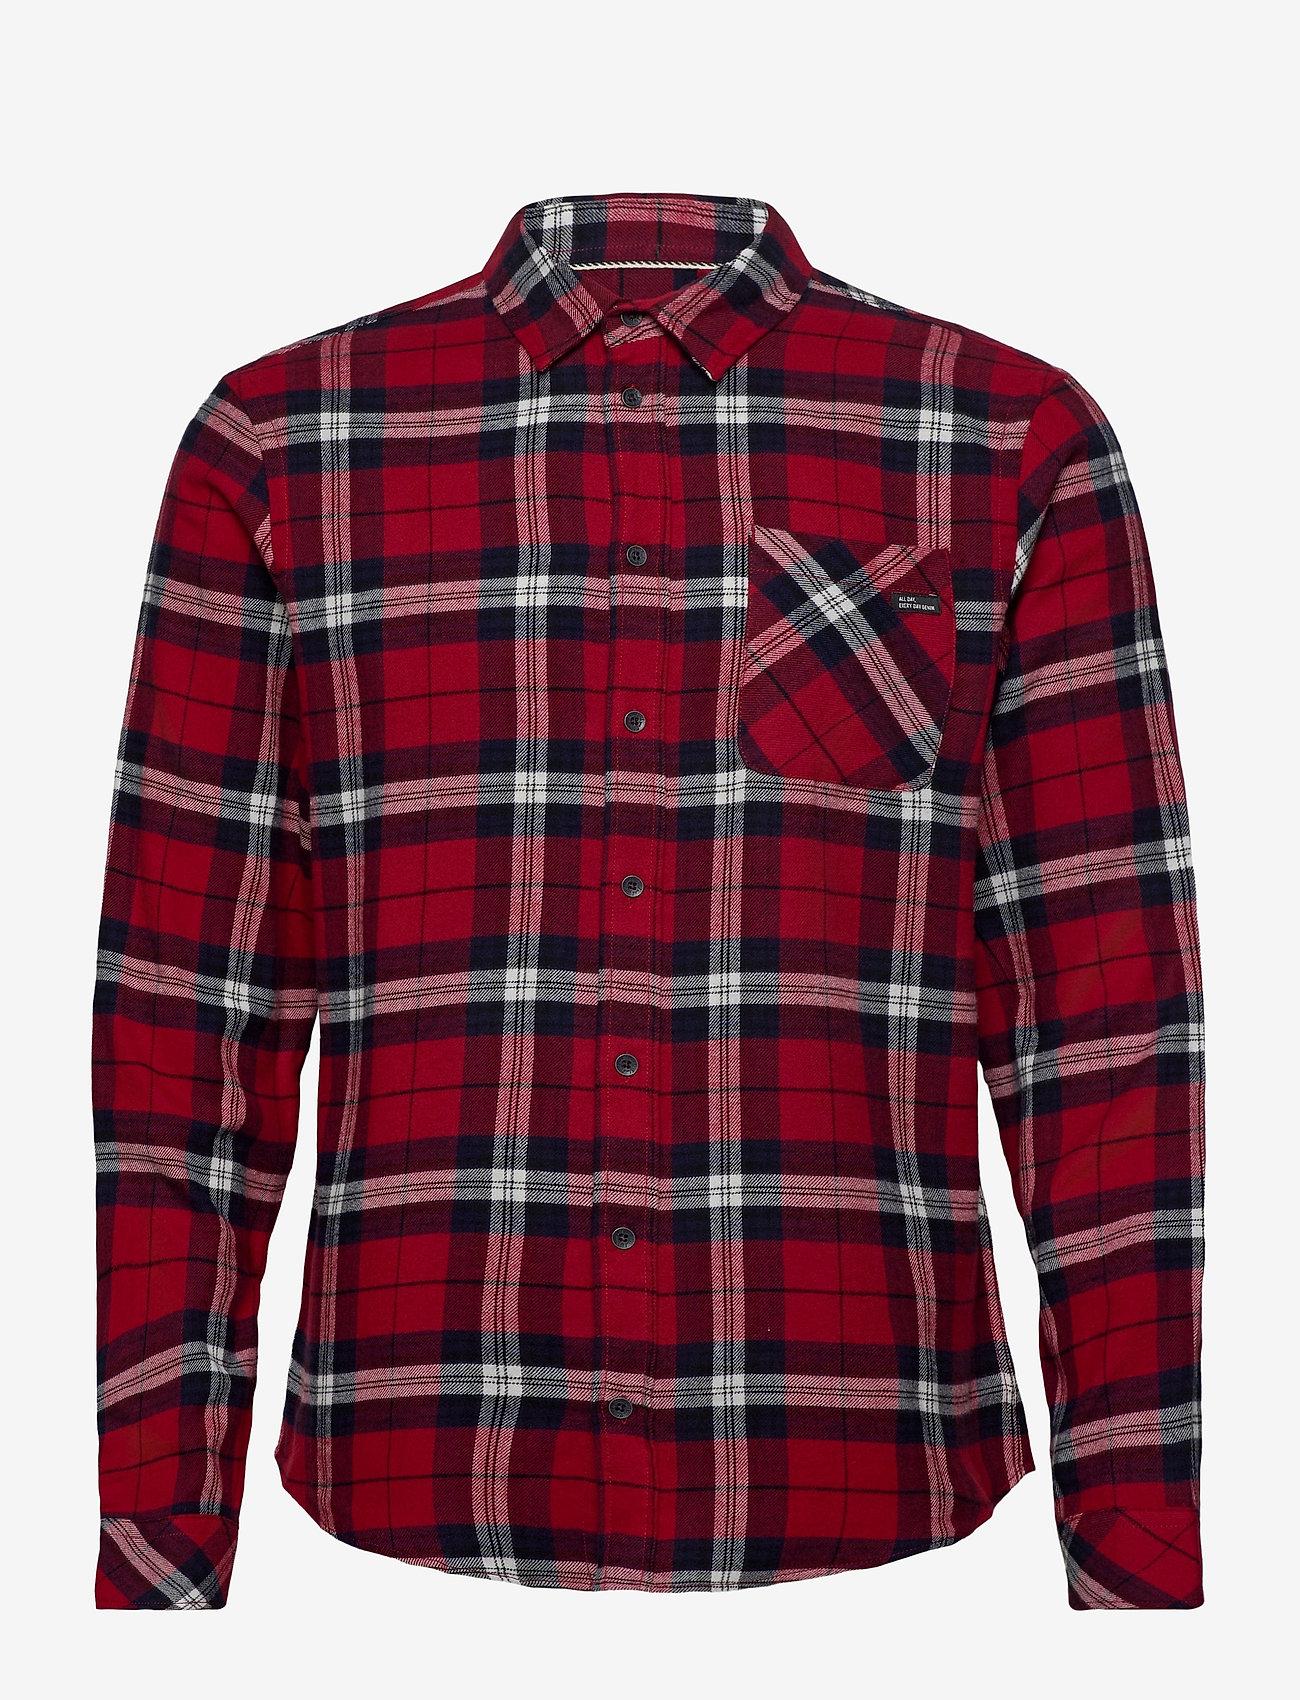 Blend - Shirt - koszule w kratkę - chili pepper - 0